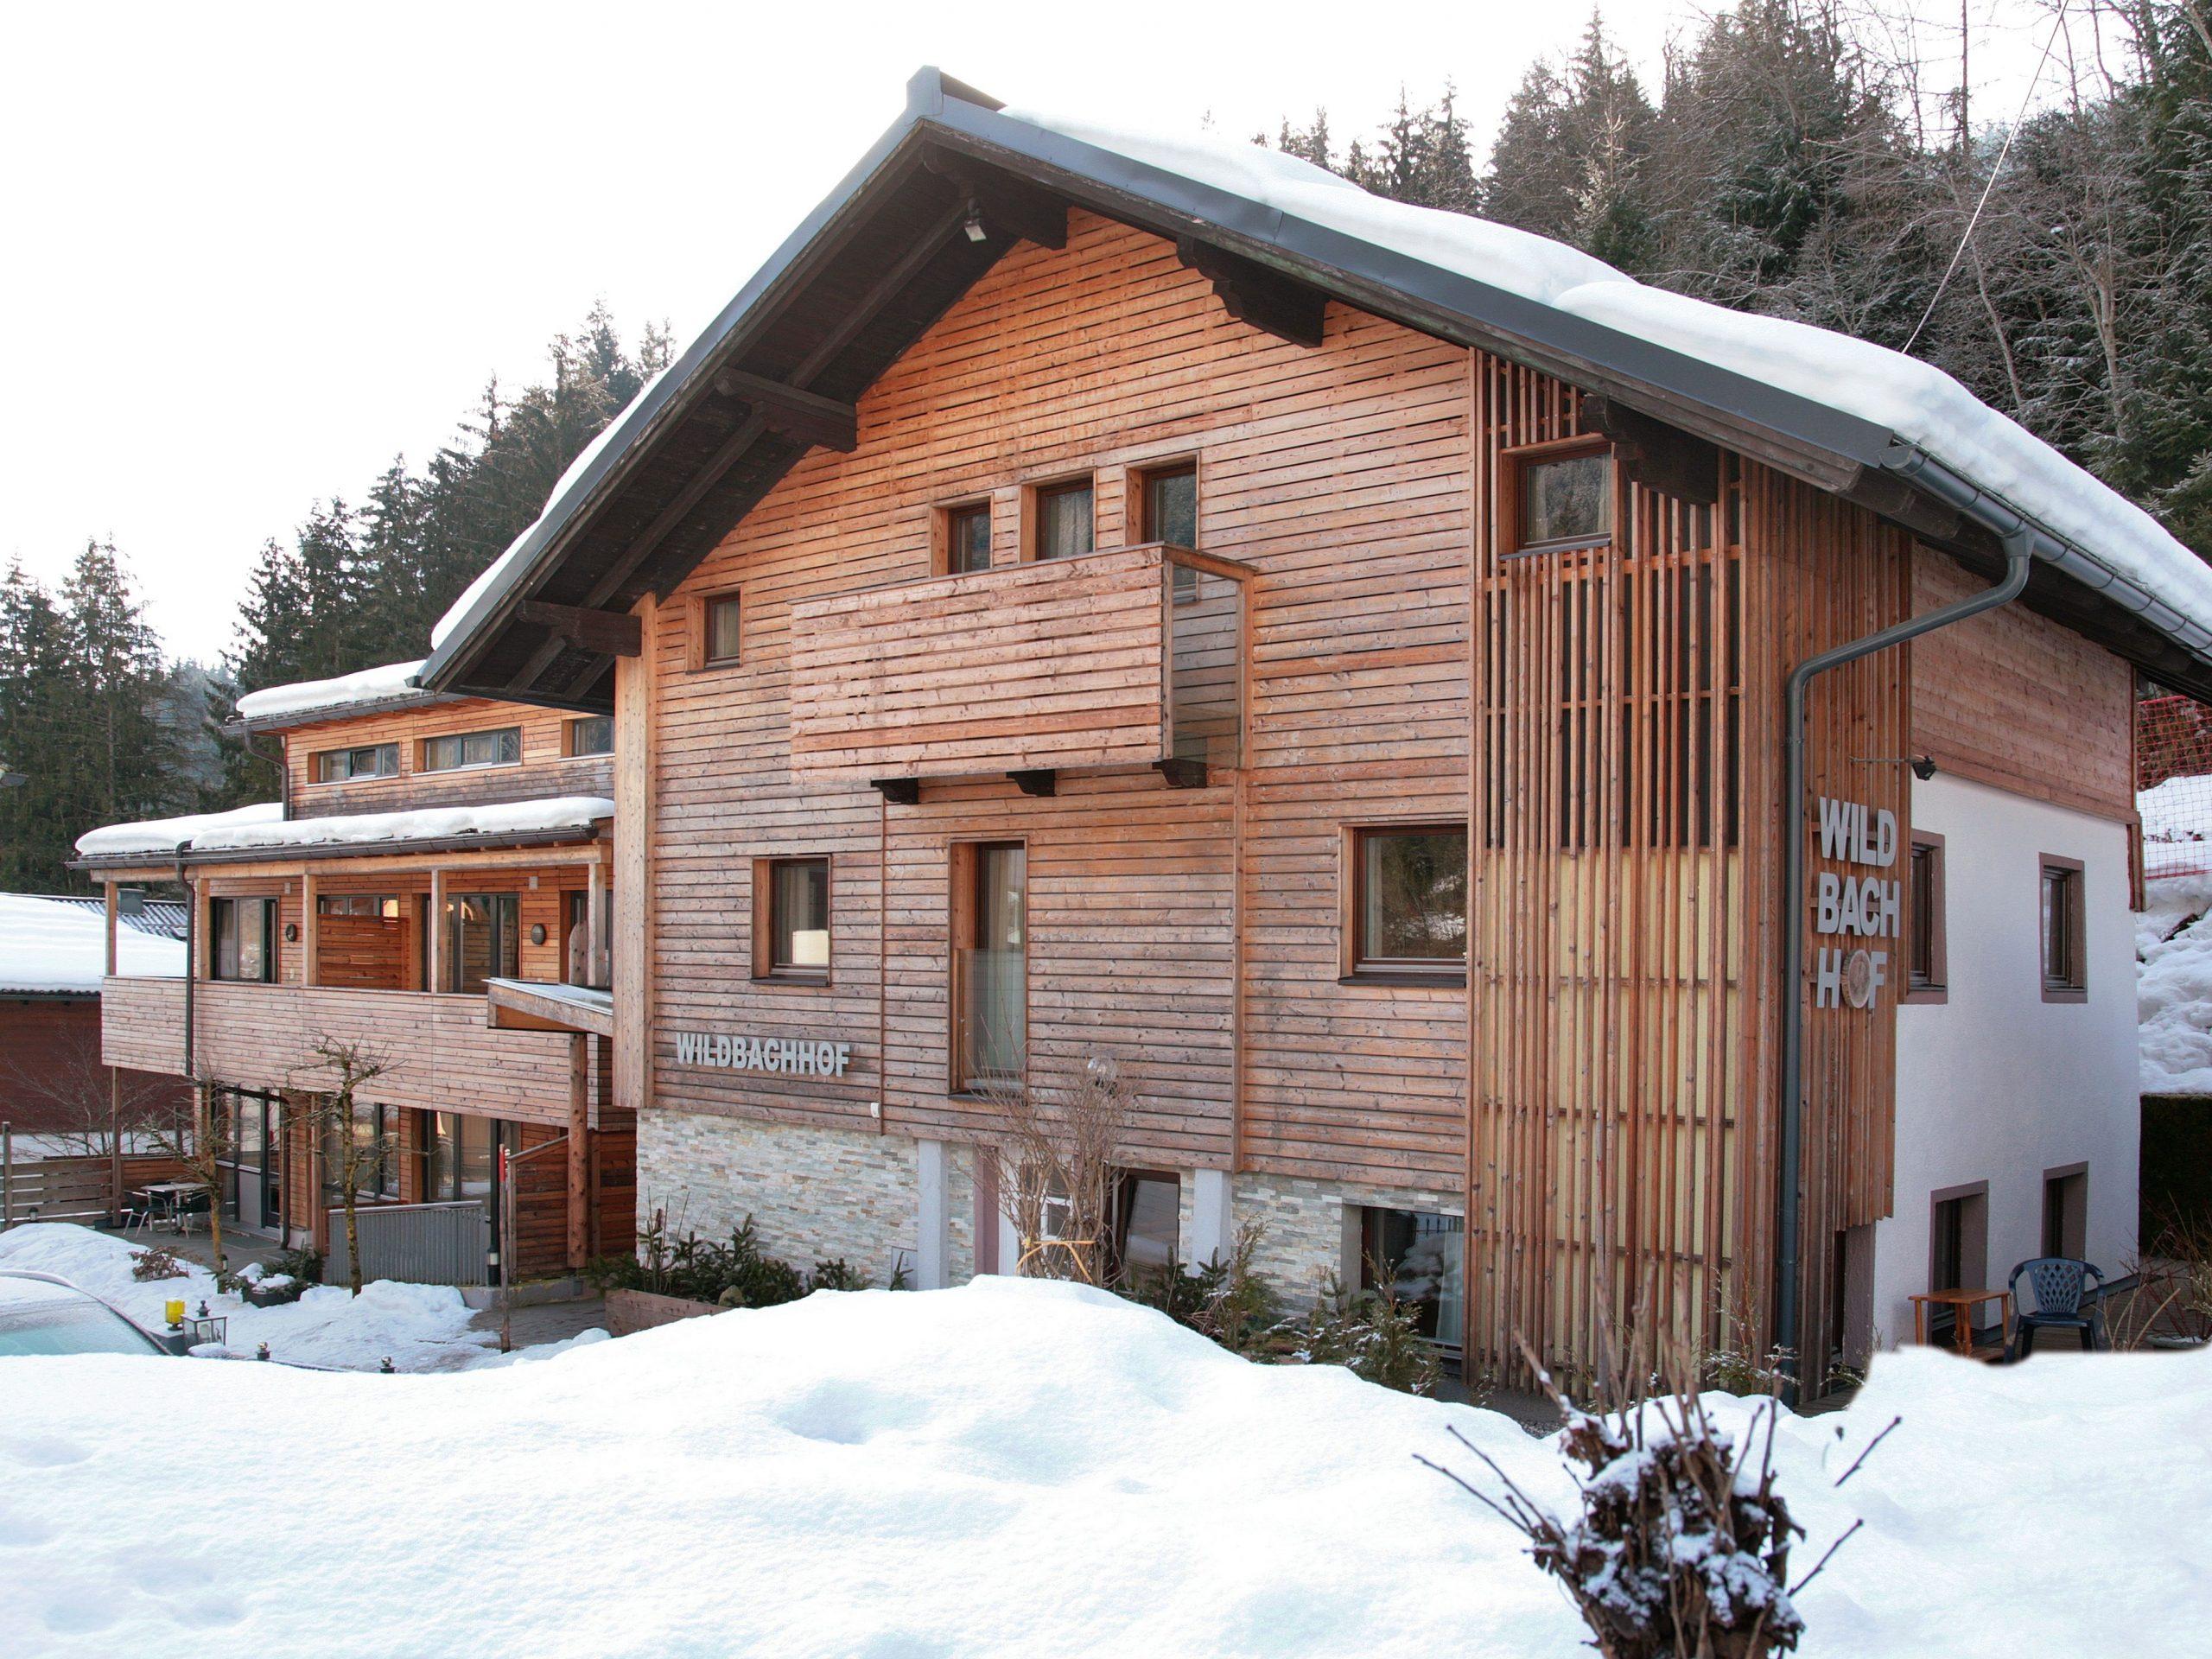 Appartement Wildbachhof combi - 4-8 personen